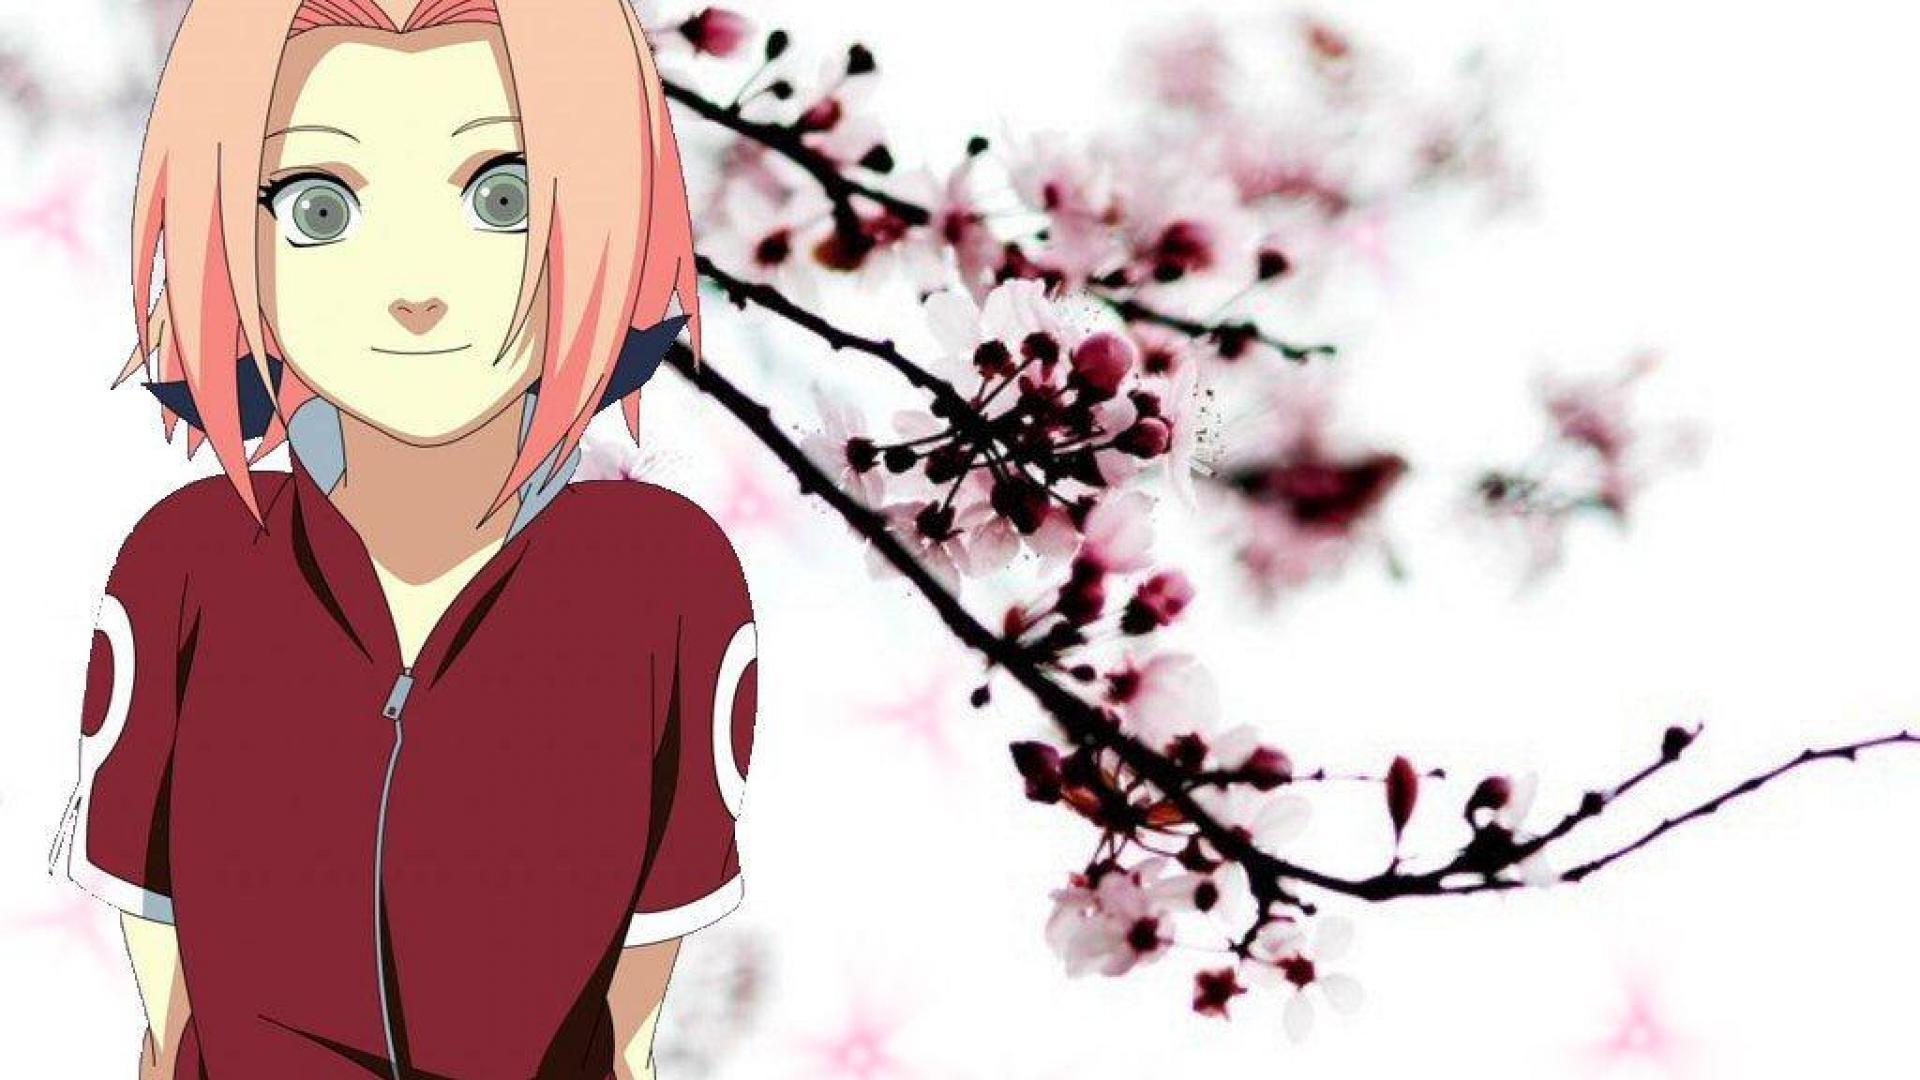 Image Result For Manga Wallpaper Downloada